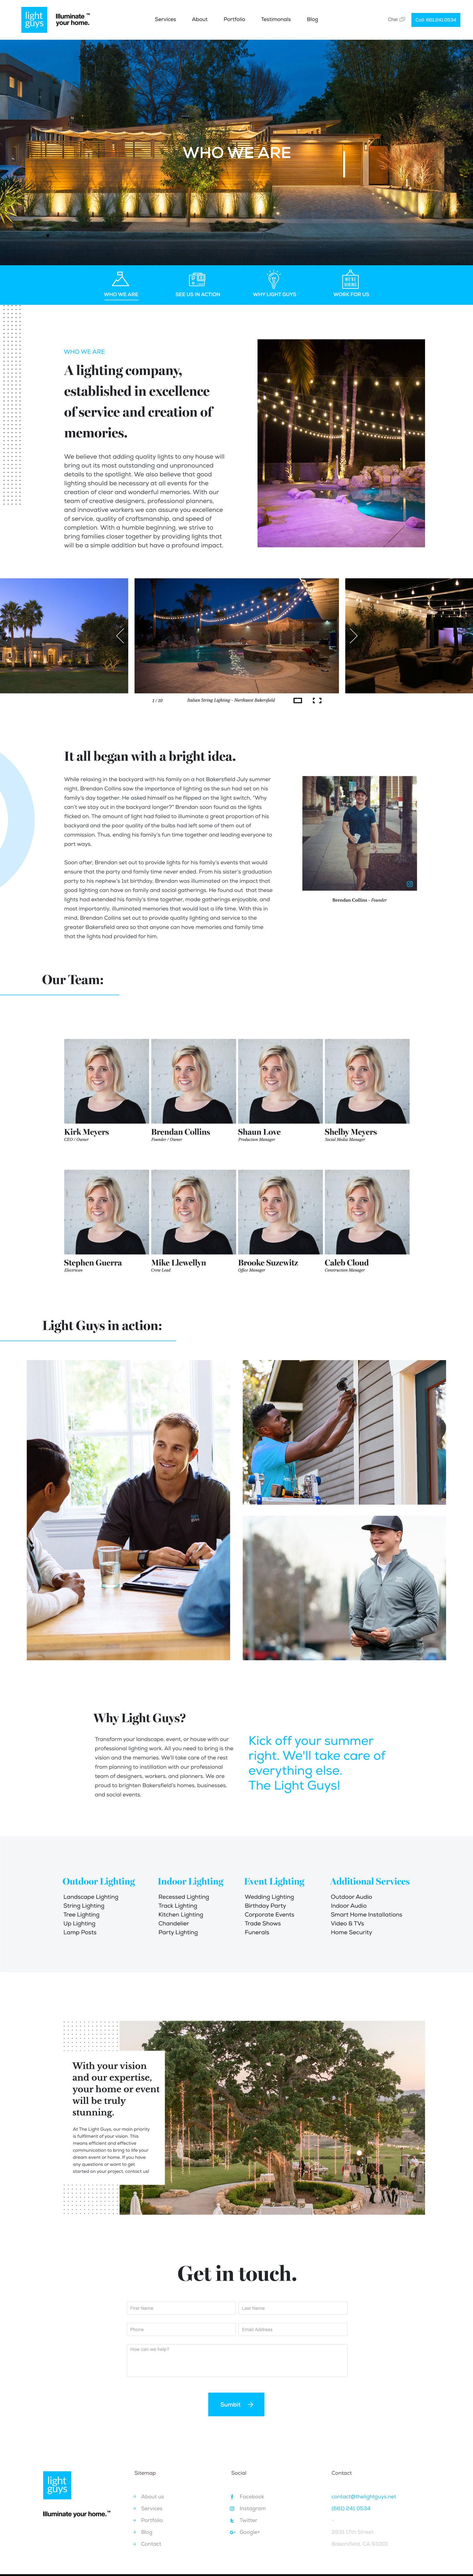 Web Design | Light Guys - About (Desktop View)